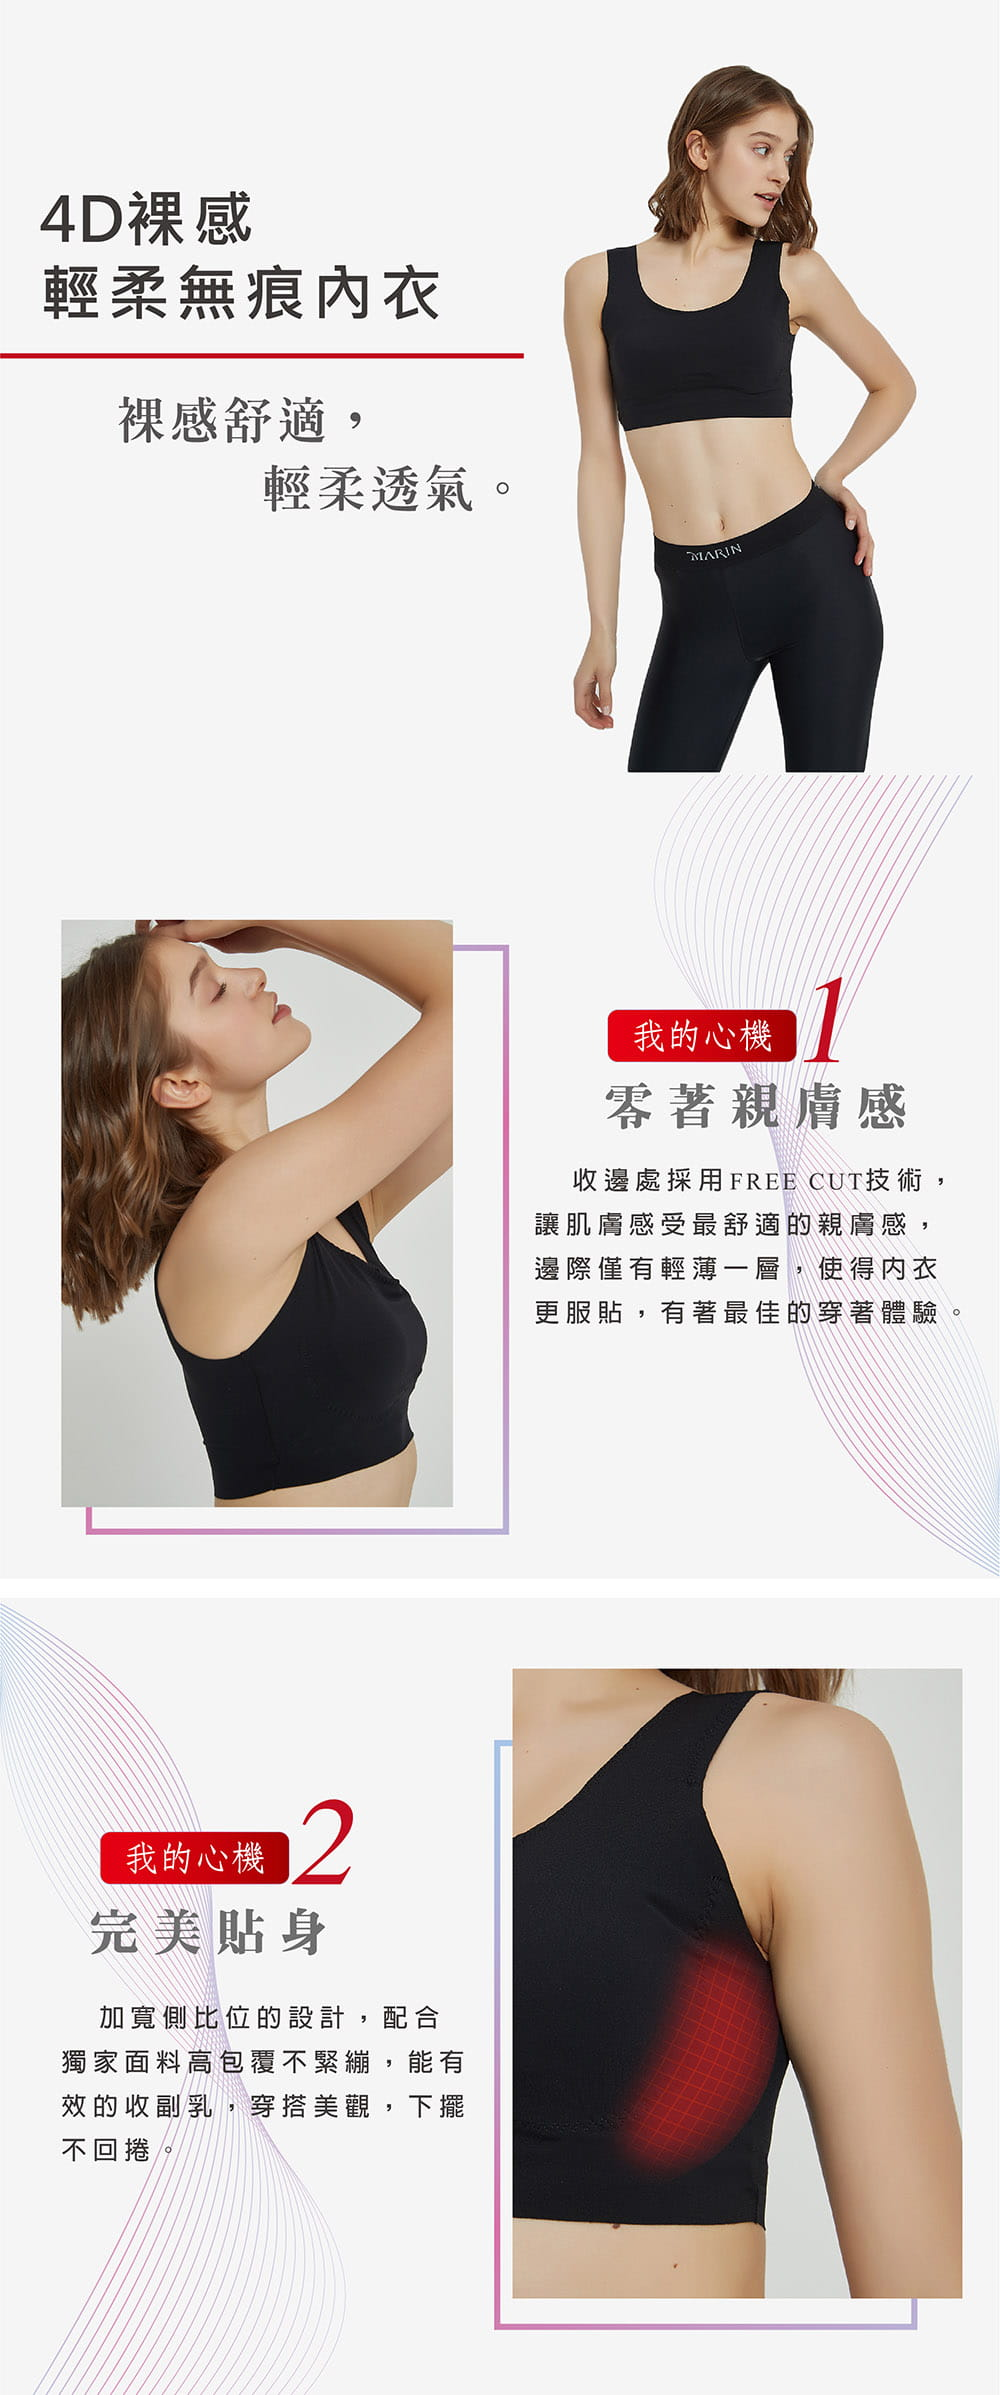 【MARIN】台灣製-4D裸感輕柔無痕內衣 1